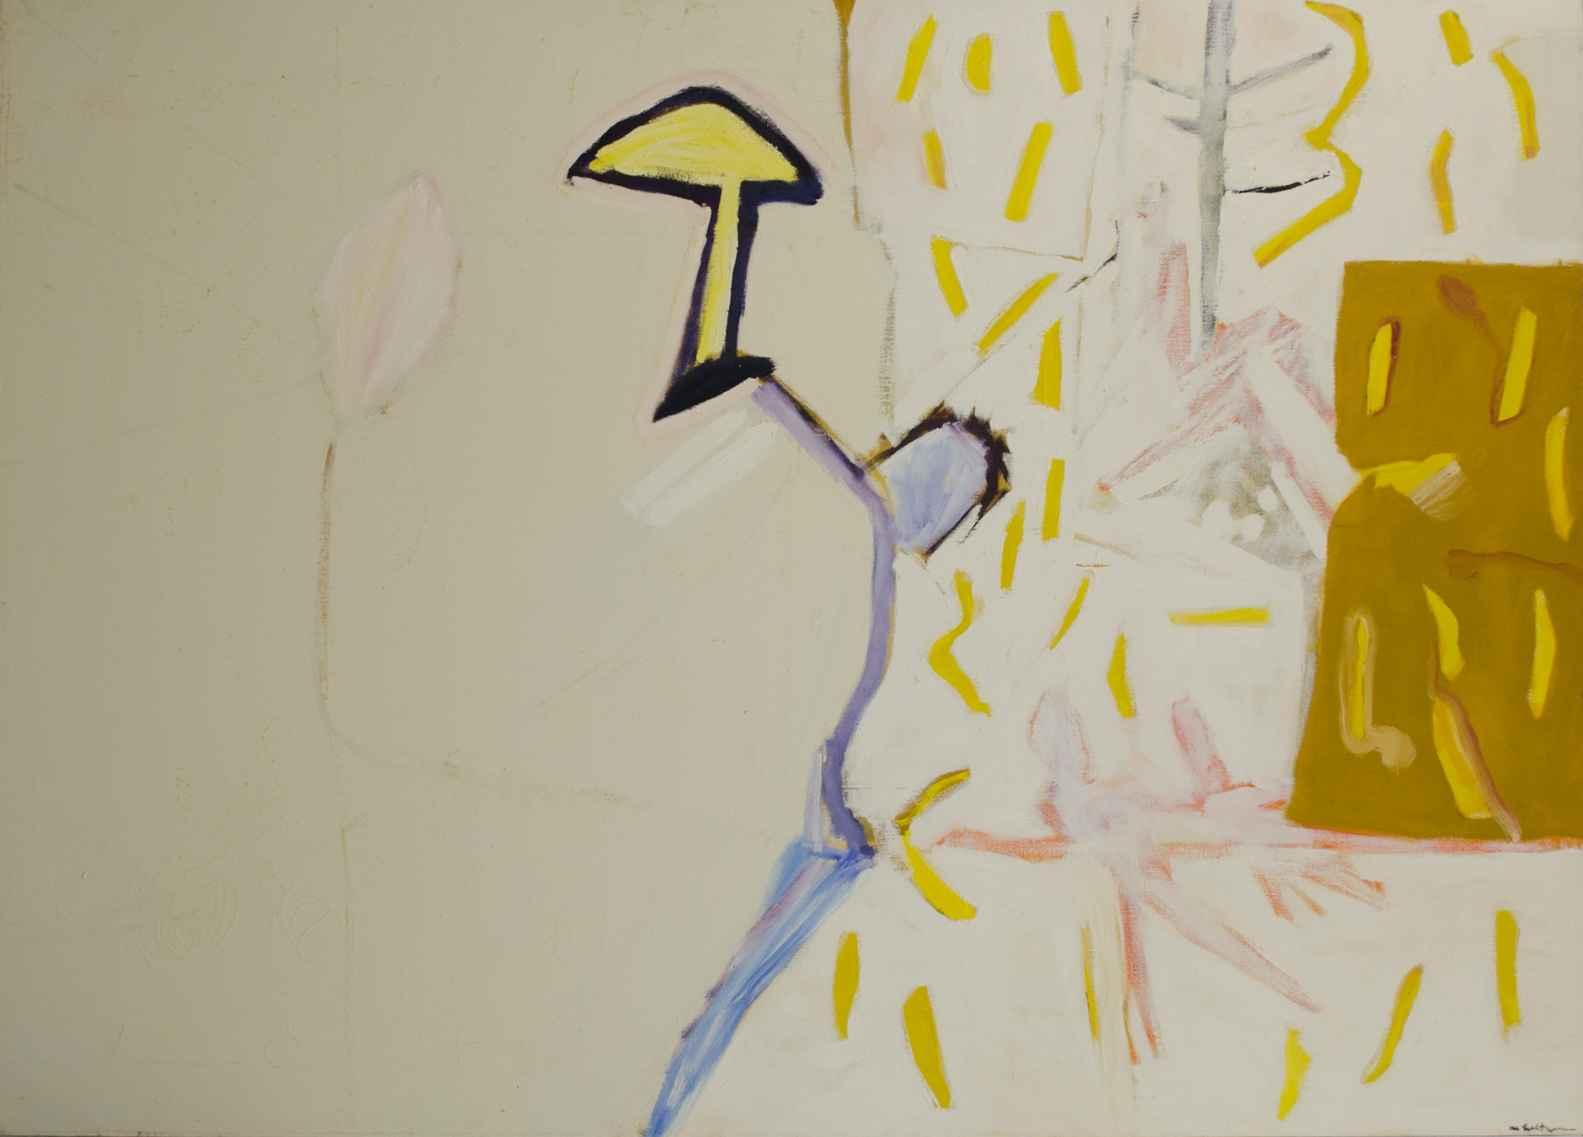 VARIED DIRECTIONS 197... by  Marvin Saltzman - Masterpiece Online